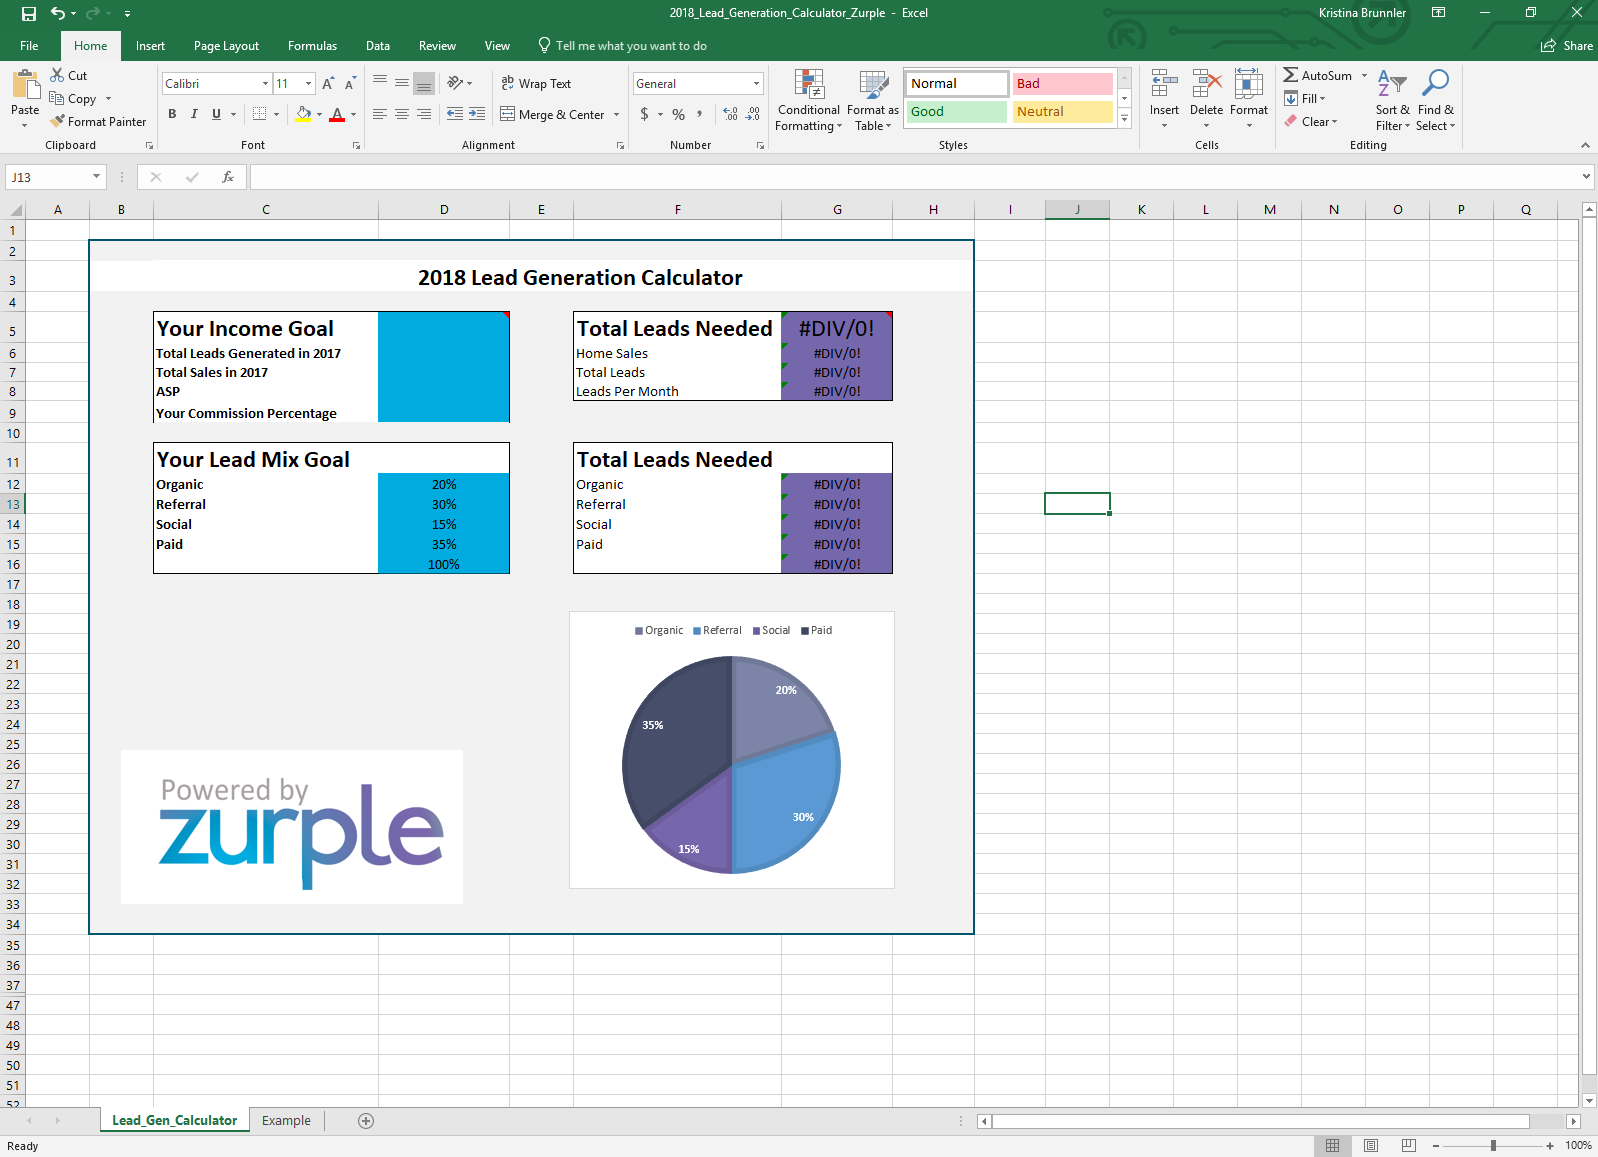 Lead Generation Calculator Screenshot 2